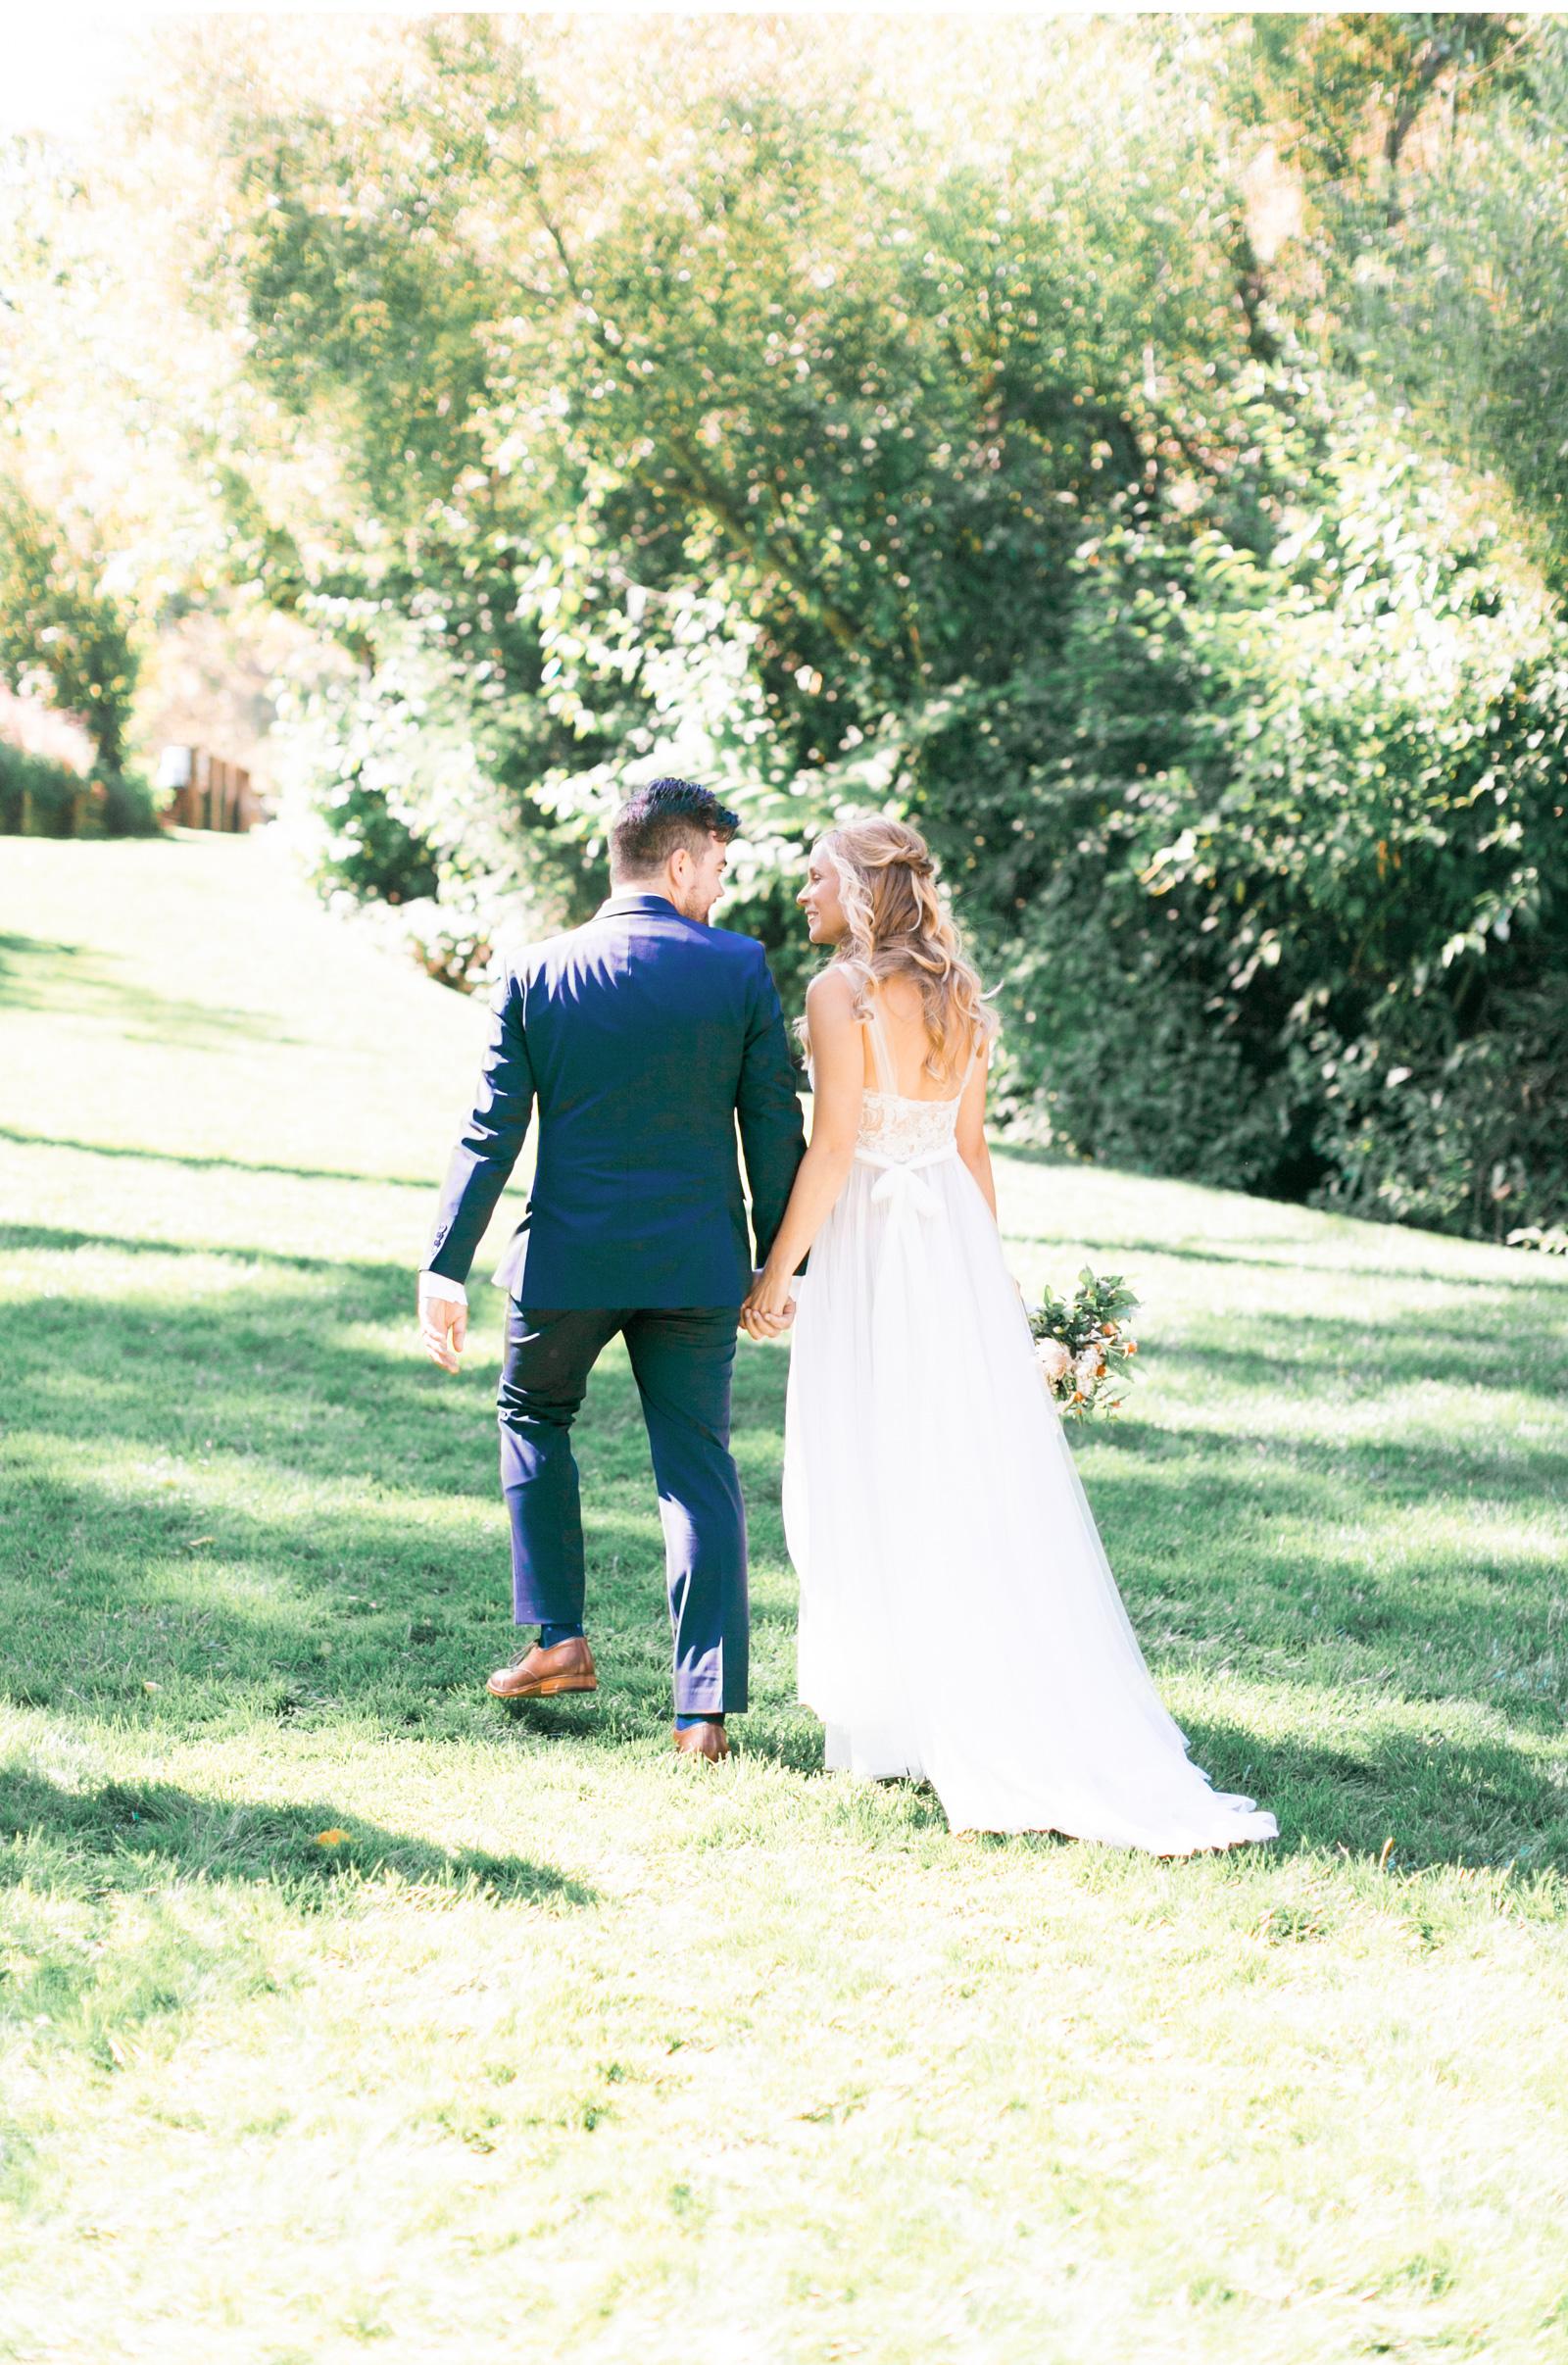 Sea-Canyon-Fruit-Ranch-Wedding-Natalie-Schutt-Photography_02.jpg